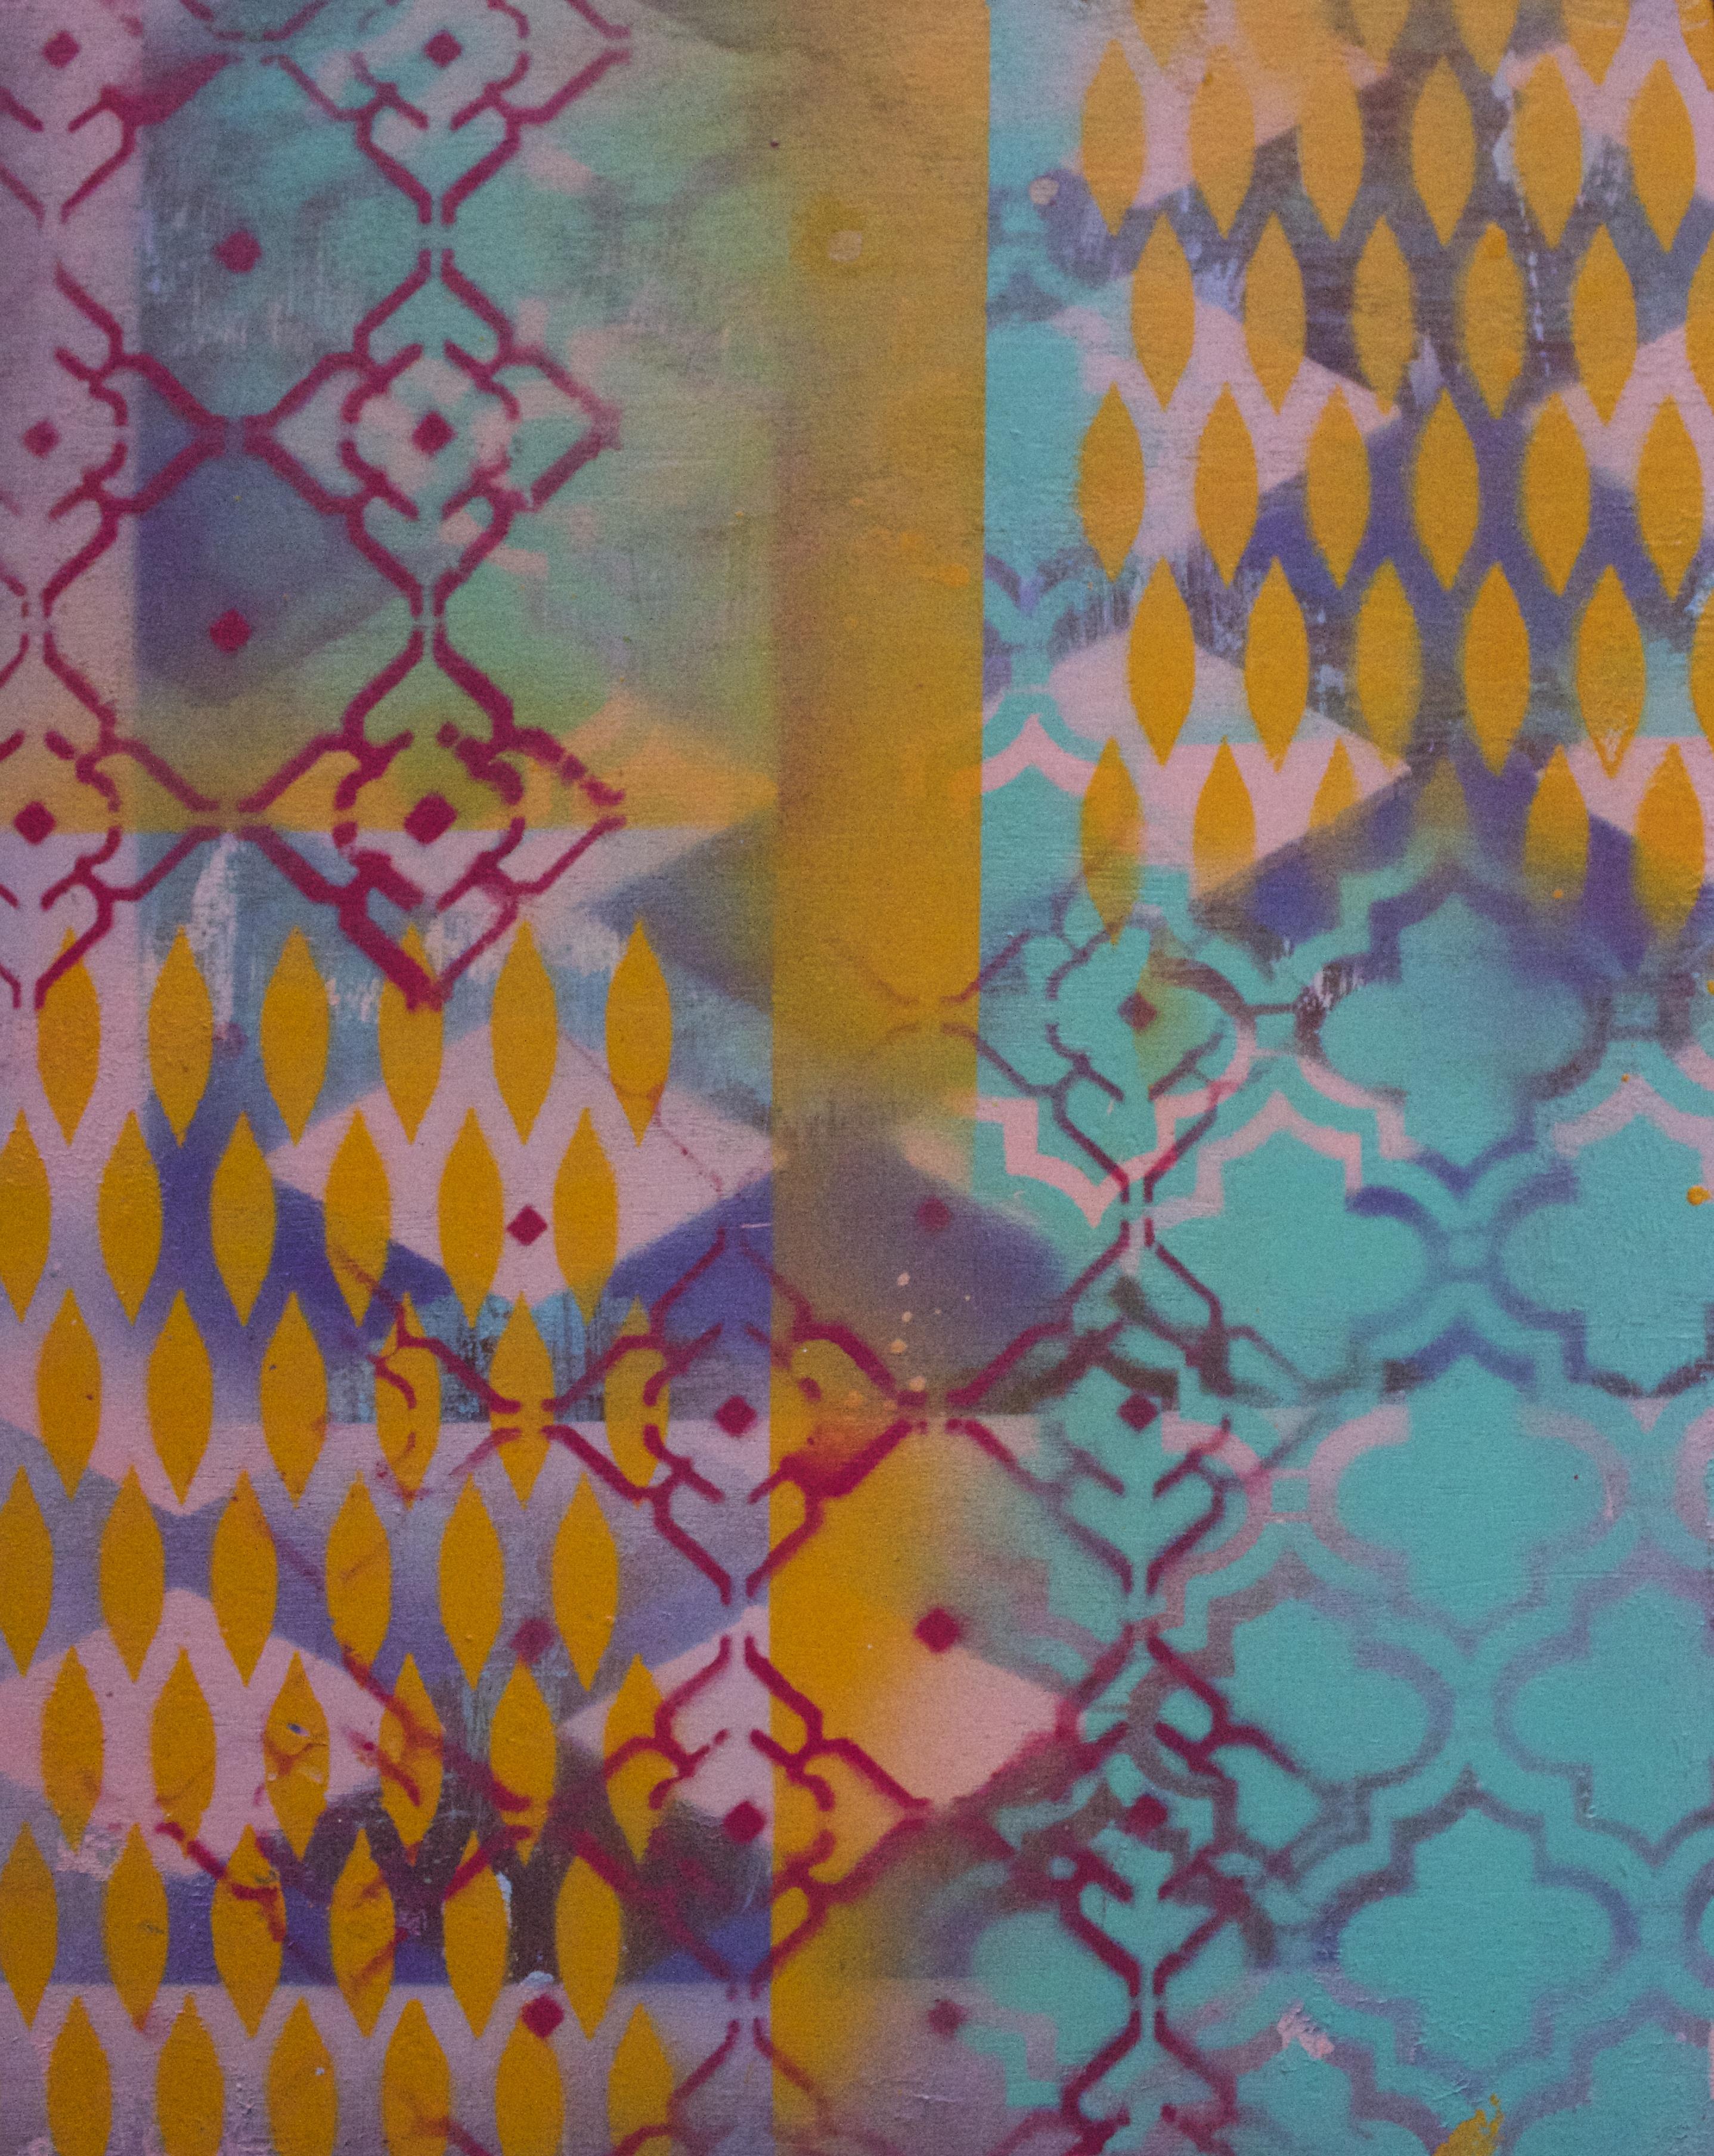 Acrylic on wood block, 8x10 - SOLD